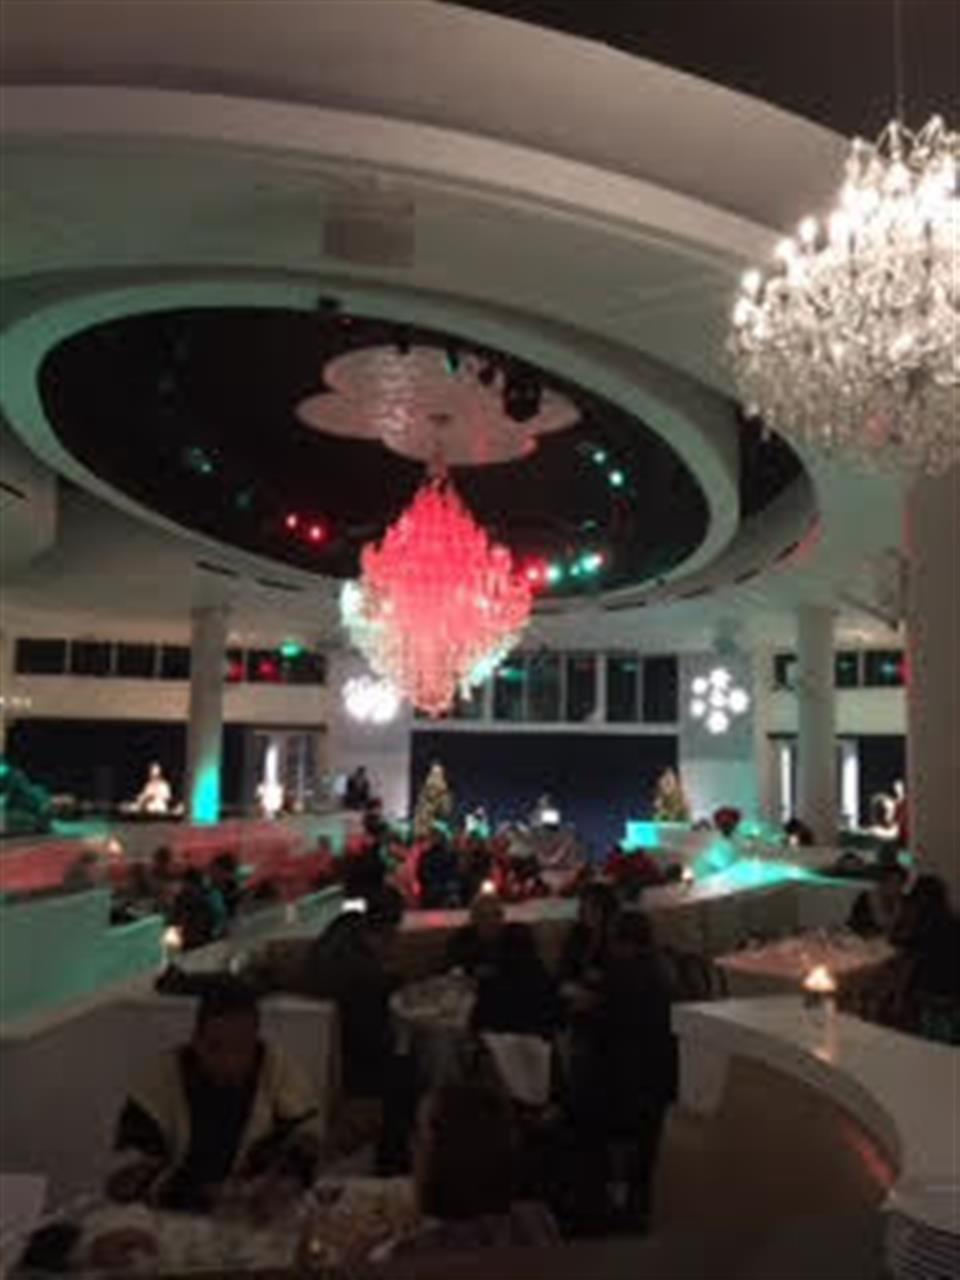 Havana Room at Tropicana Las Vegas NV